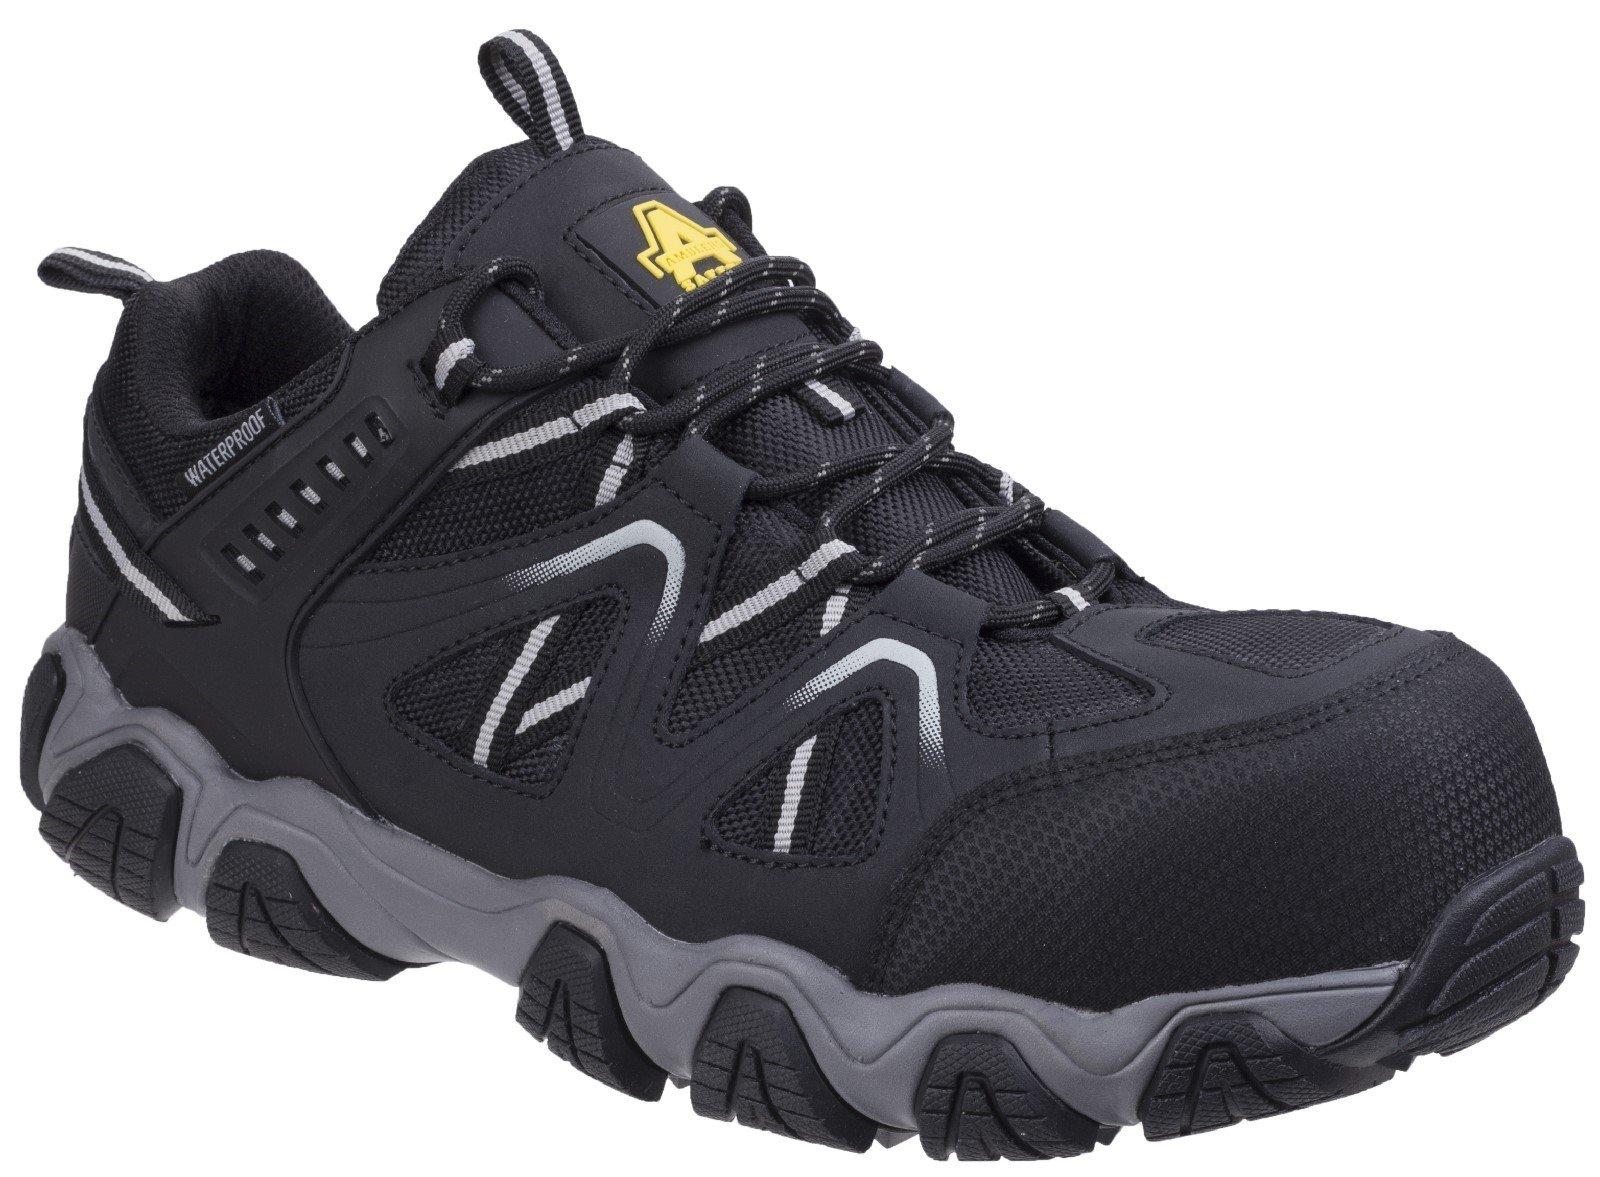 Amblers Unisex Safety Oakham Lace Up Trainer Multicolor - Black/Grey 13